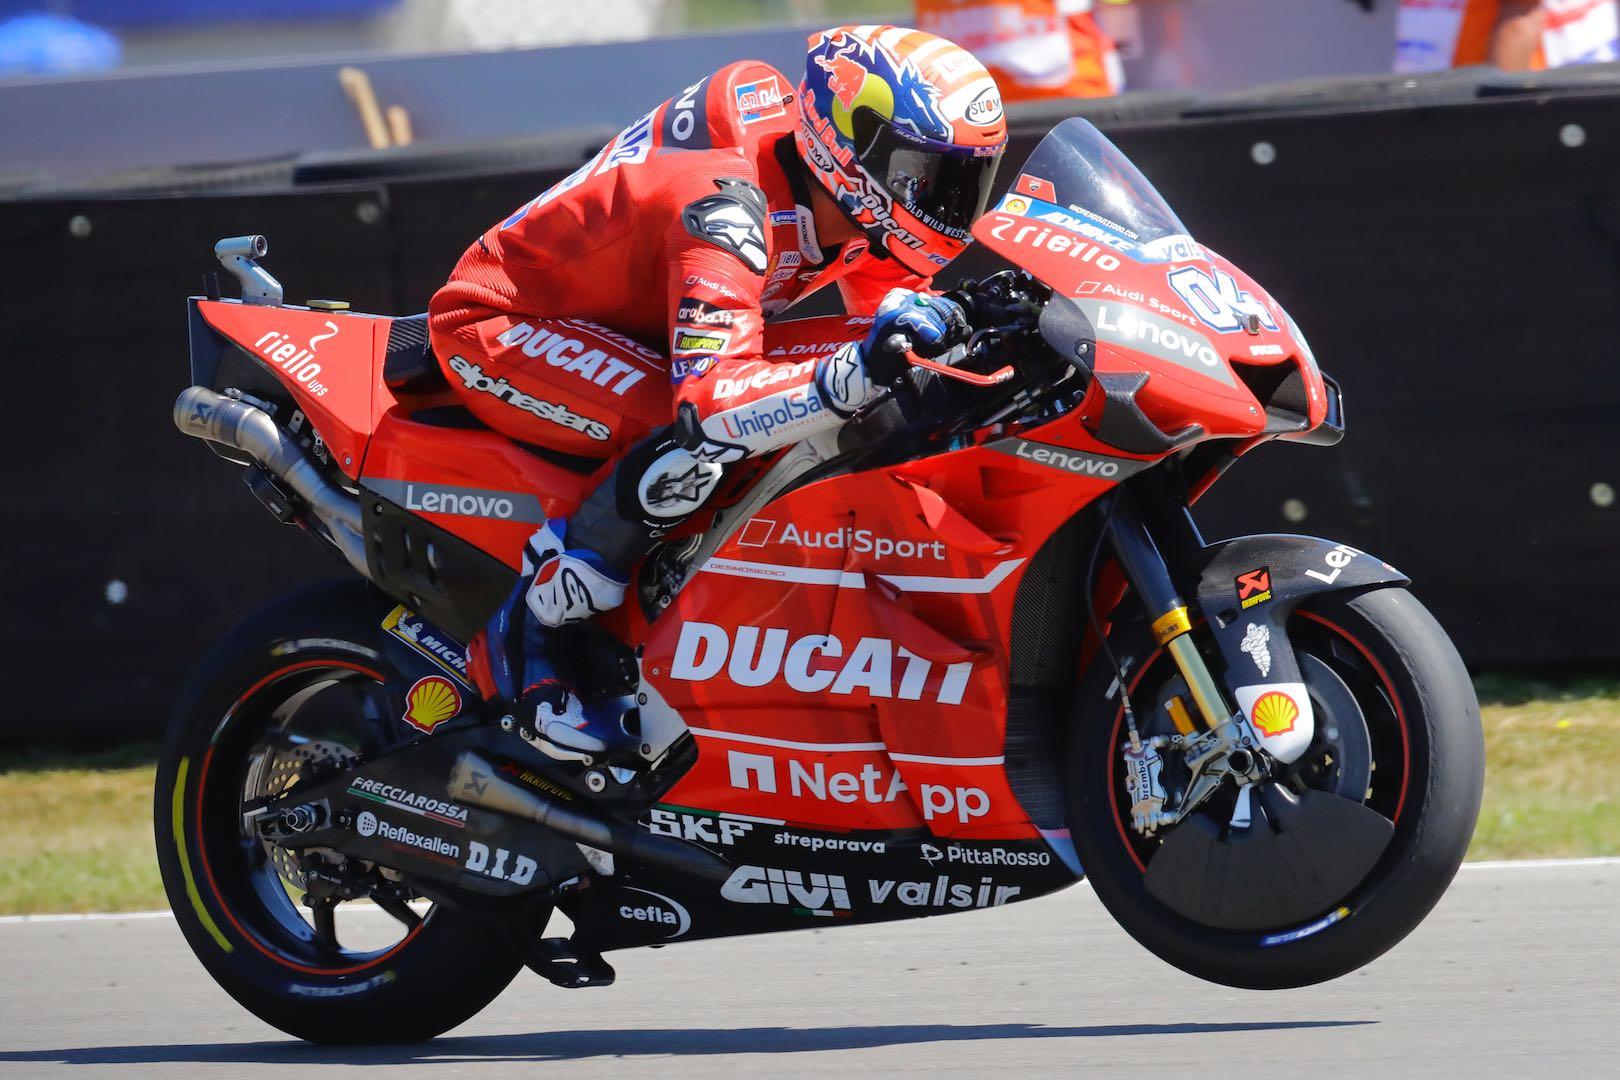 Ducati's Andrea Dovizioso at Assen MotoGP Qualifying 2019